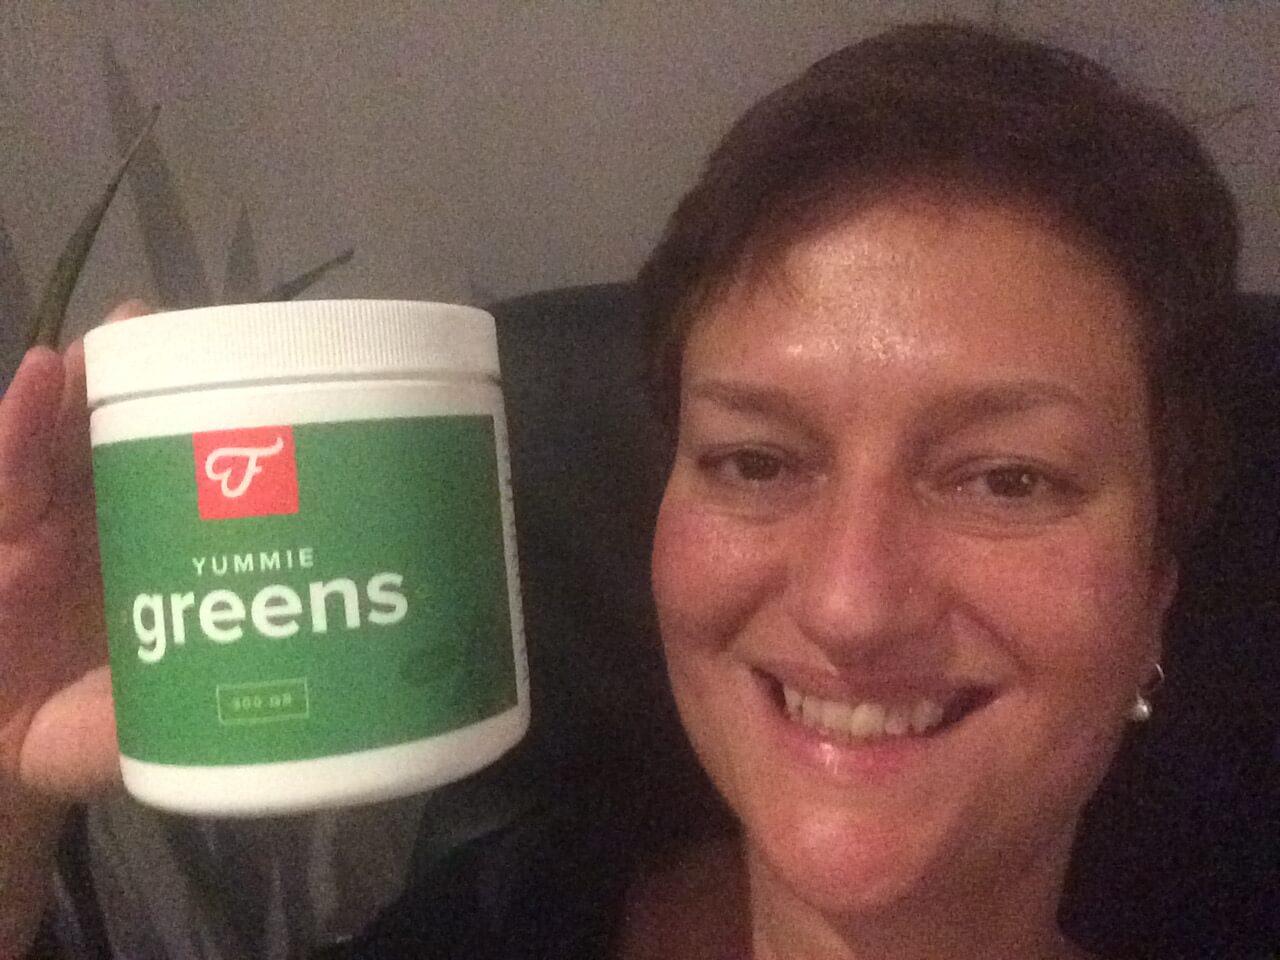 Wilma - Greens